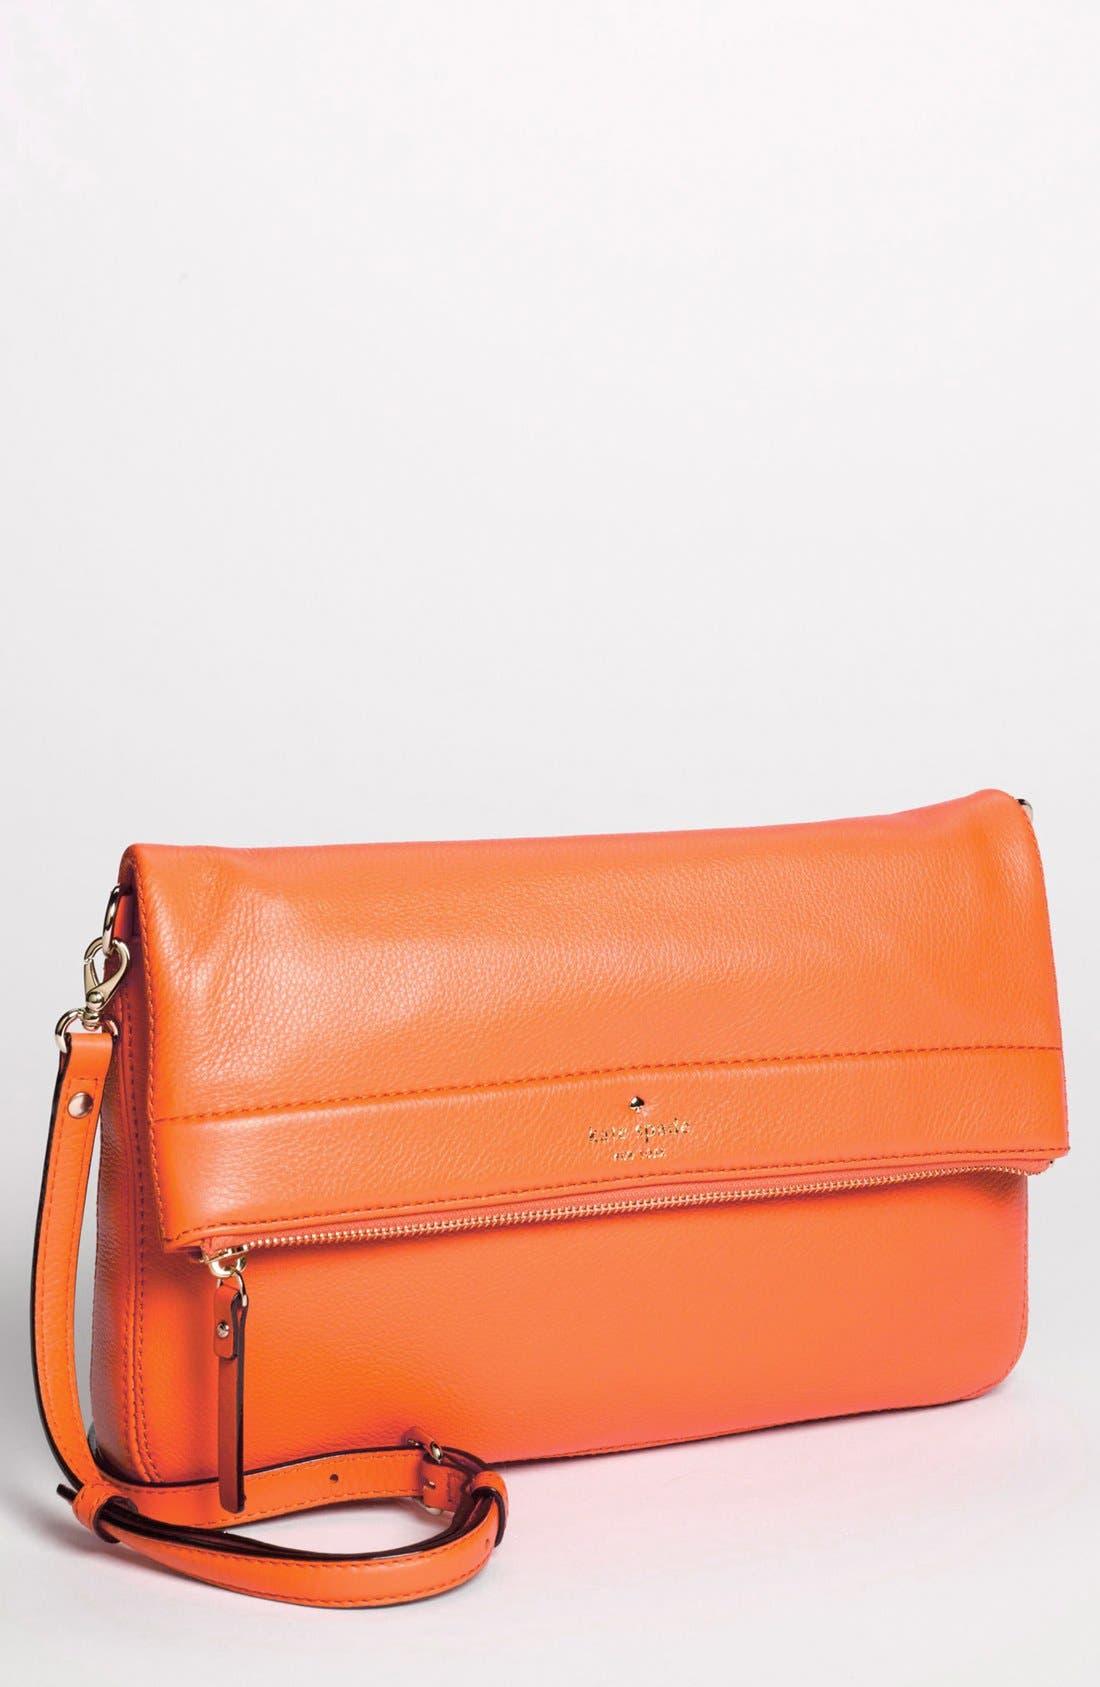 Alternate Image 1 Selected - kate spade new york 'mansfield clarke' shoulder bag (special purchase)